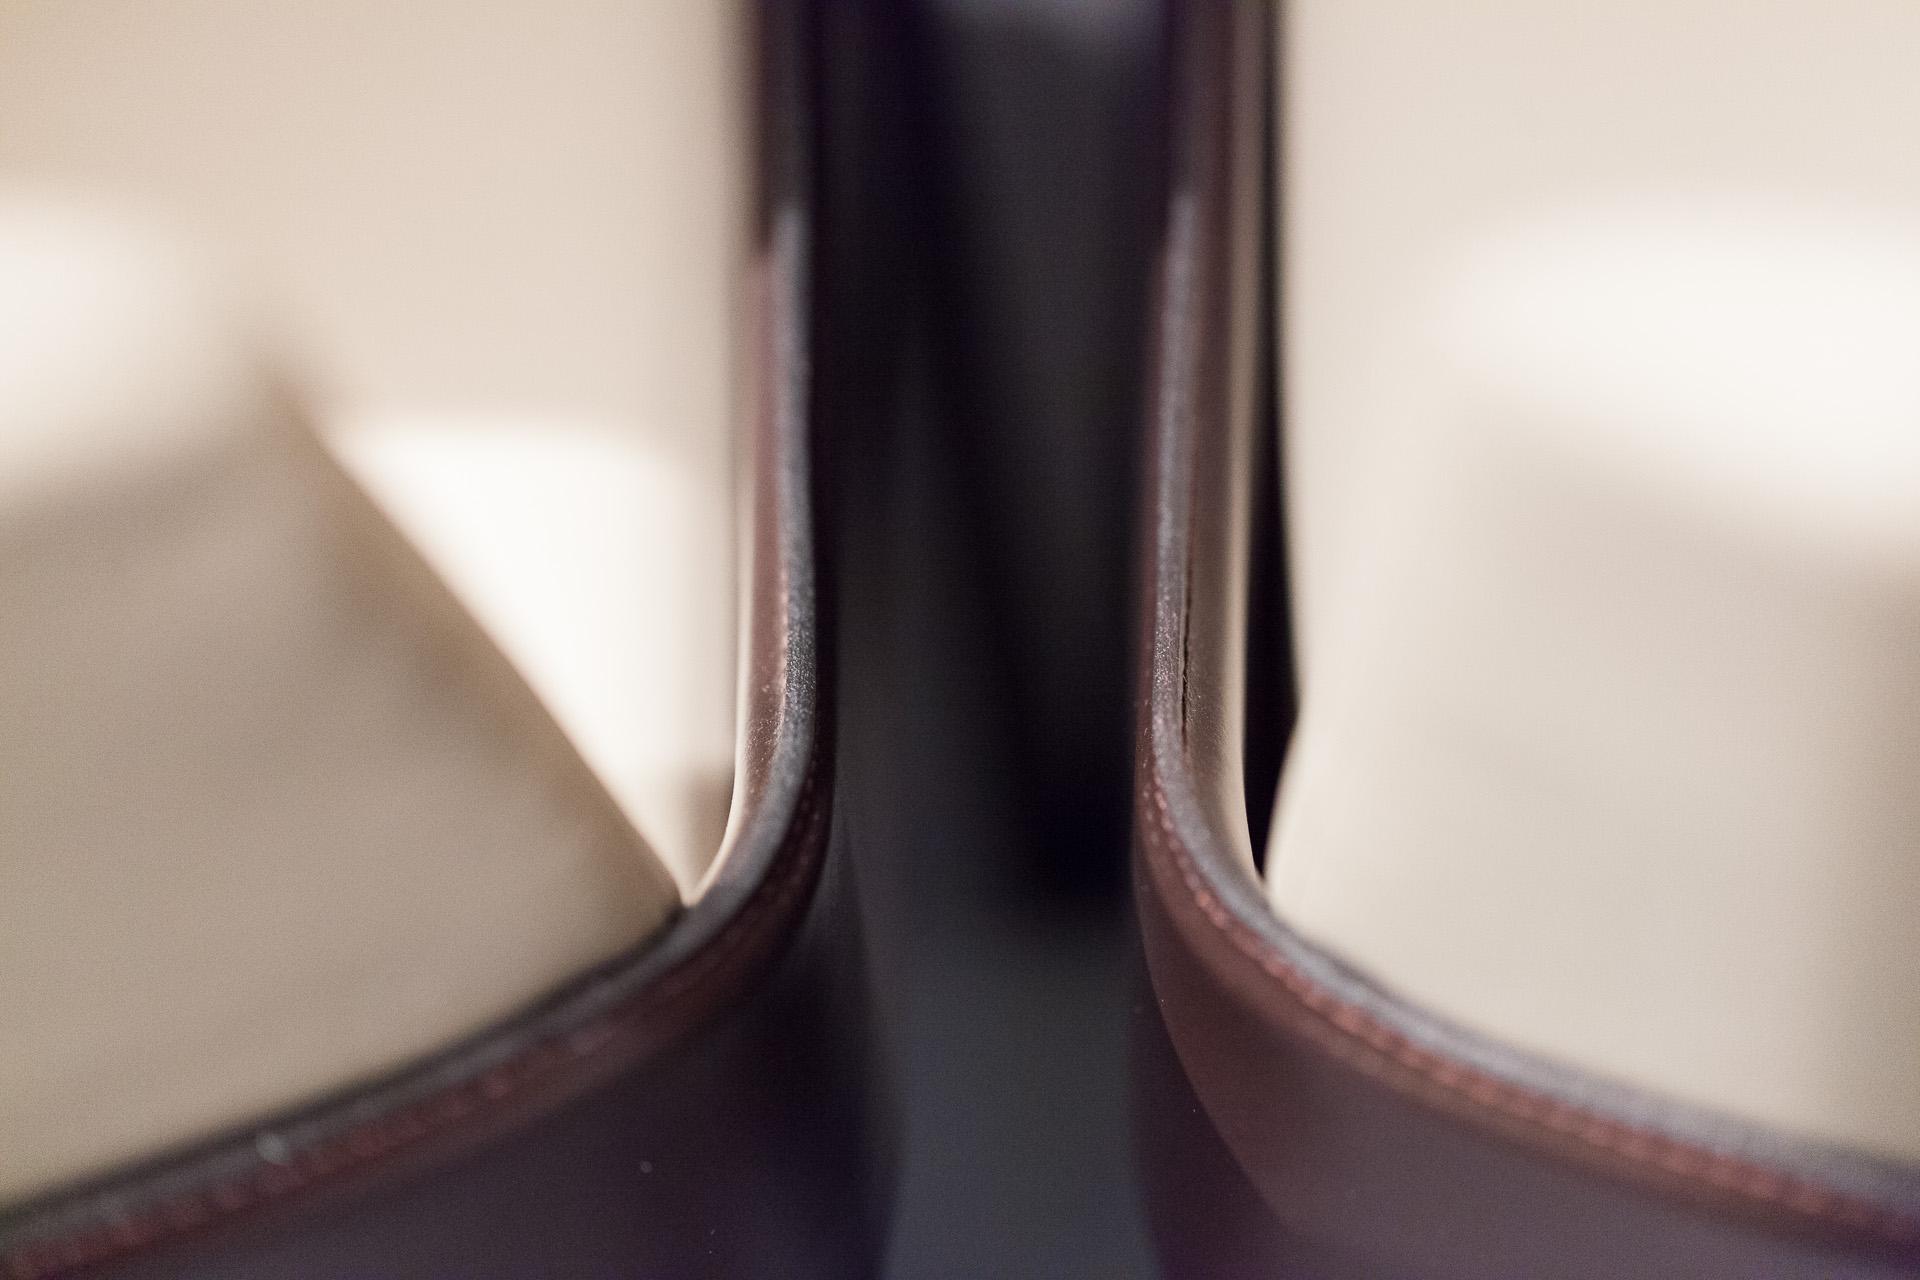 Showroom Binacci: dettaglio sedie Studio Klass per Fiamitalia, designer Marco Maturo